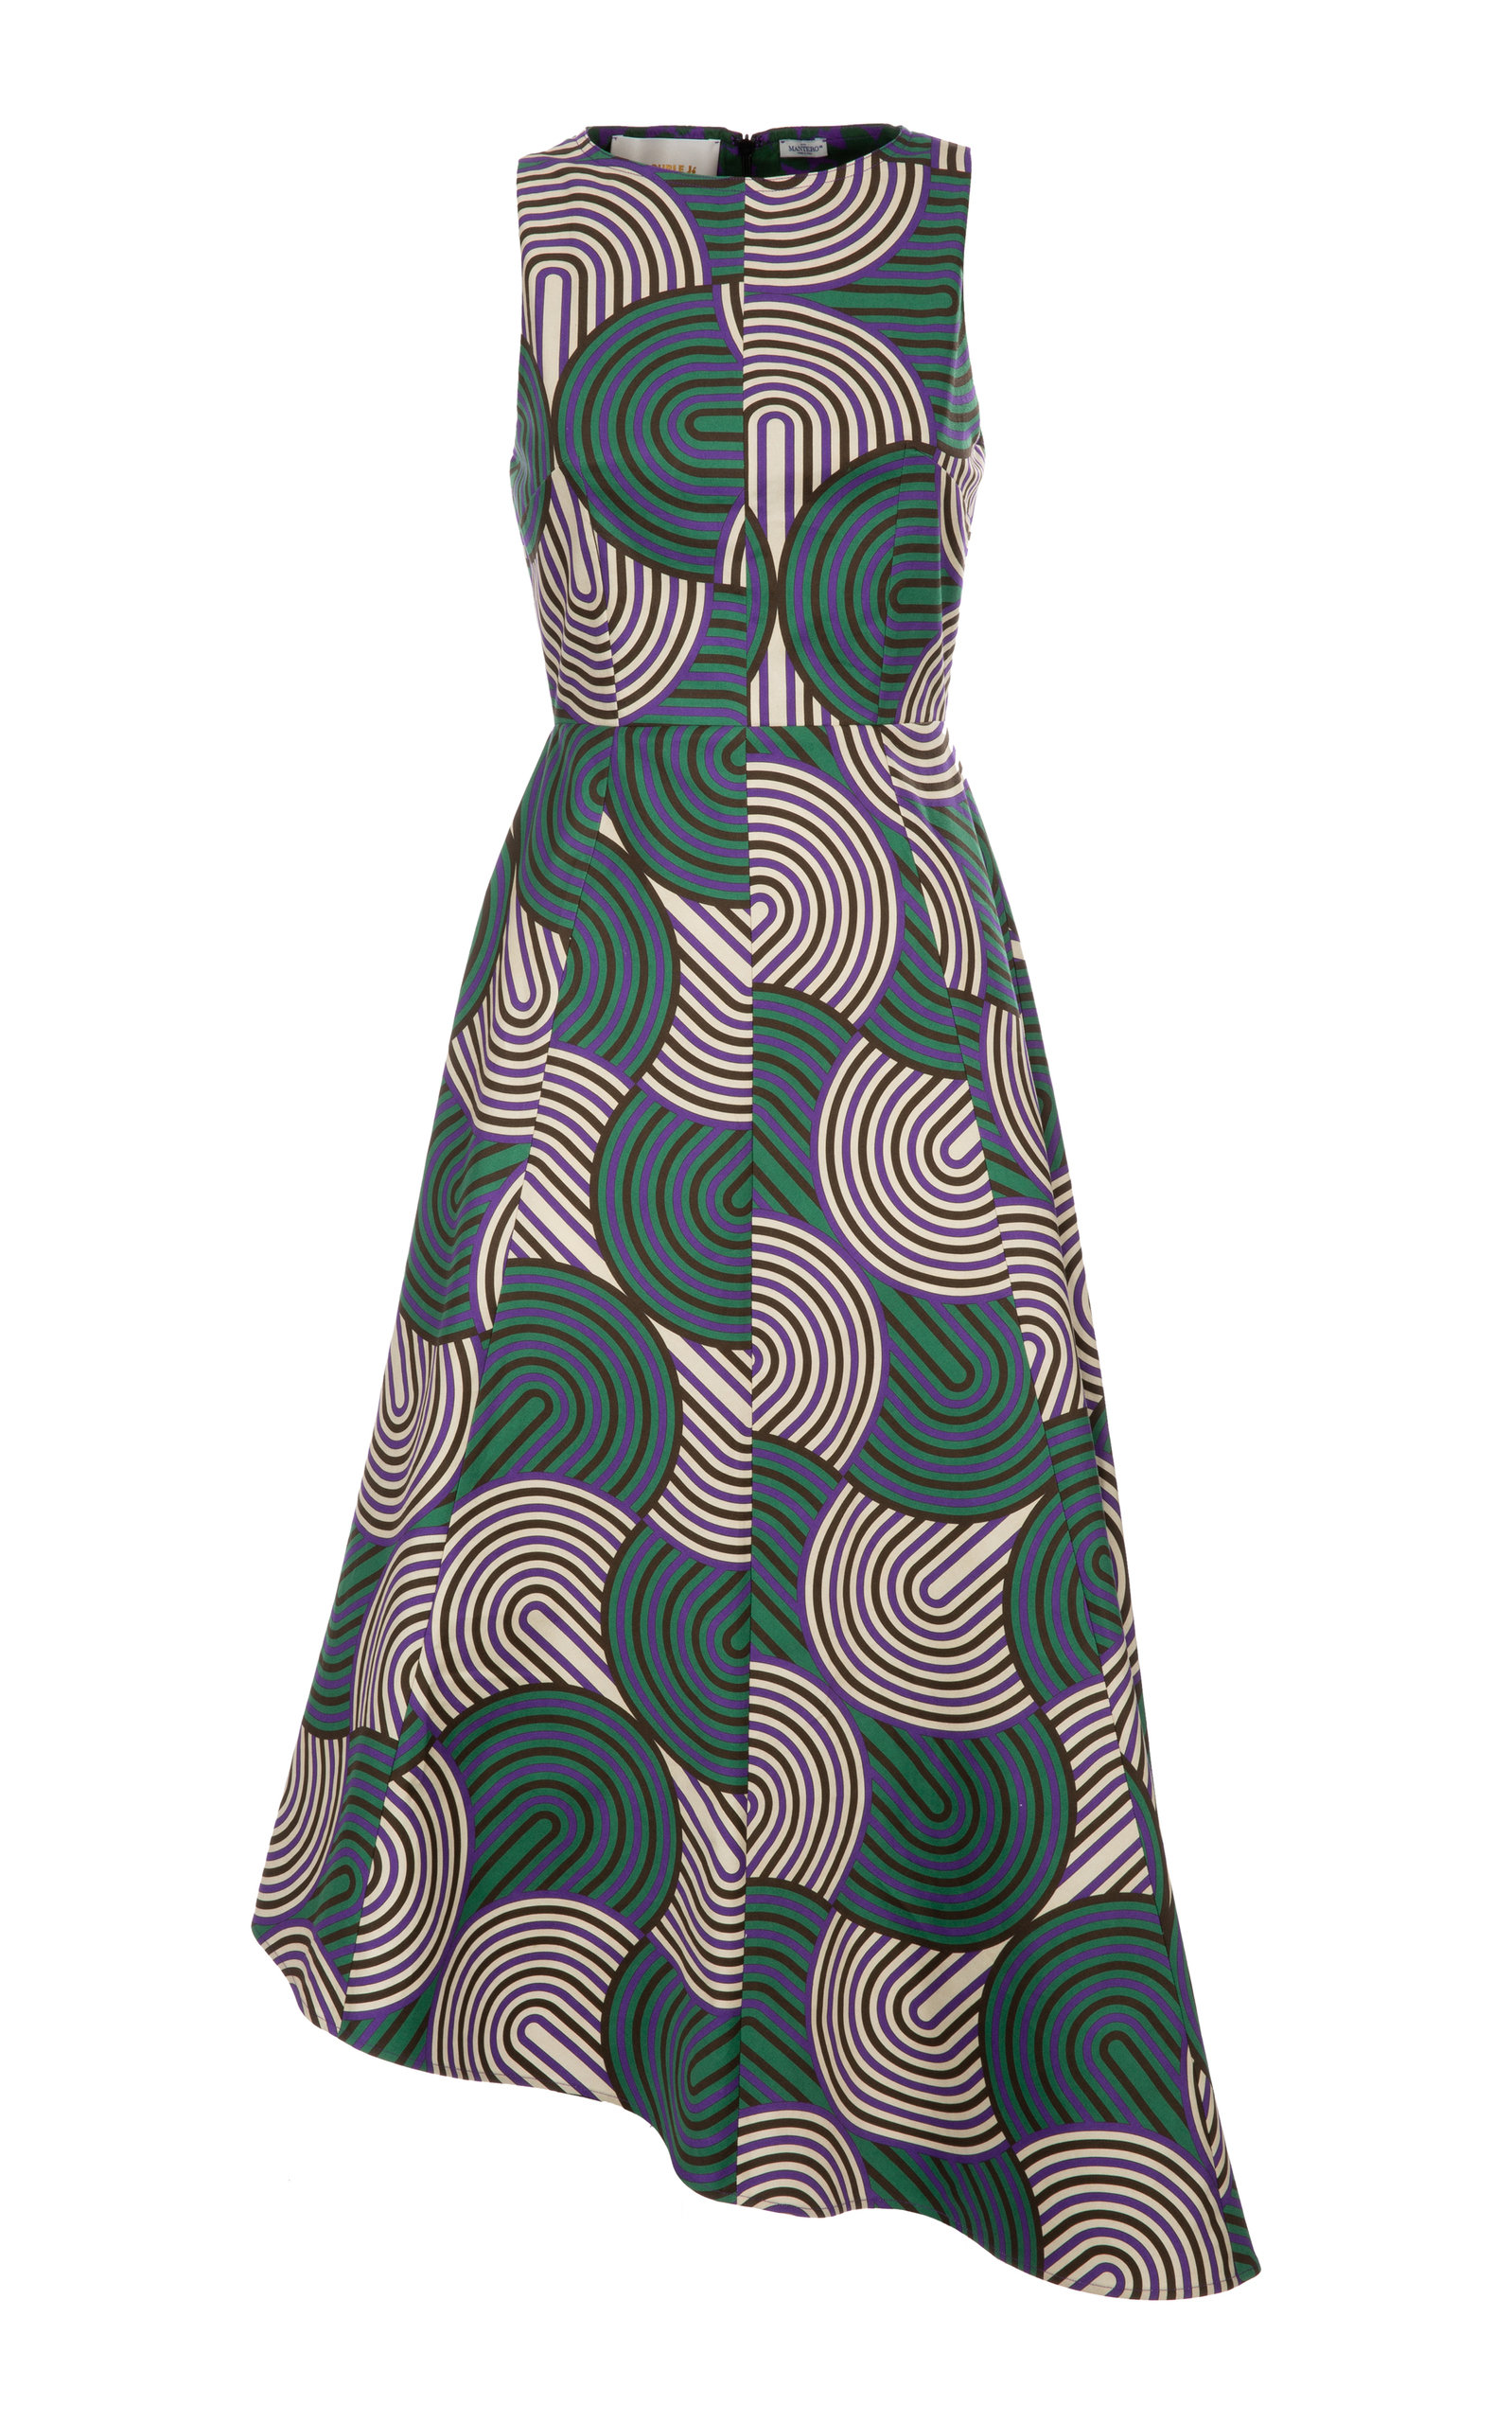 Buy La DoubleJ Pina Asymetric Printed Cotton-Blend Dress online, shop La DoubleJ at the best price